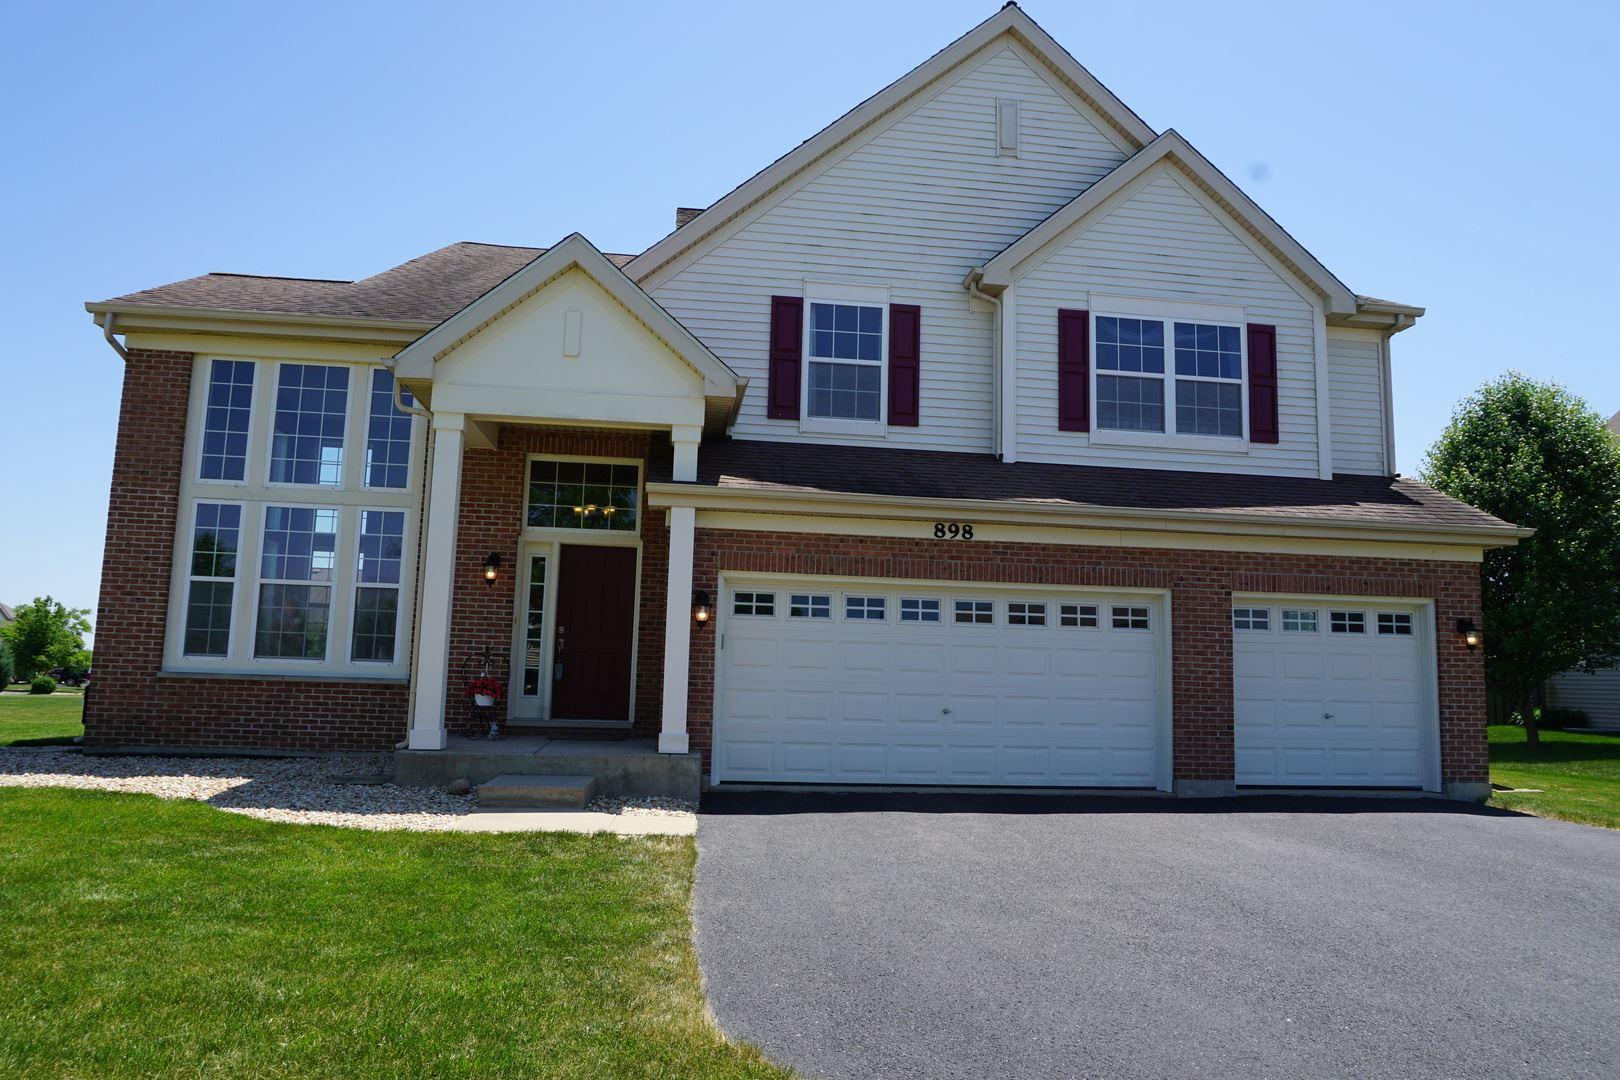 898 Parkside Lane, Yorkville, IL 60560 - #: 10653619